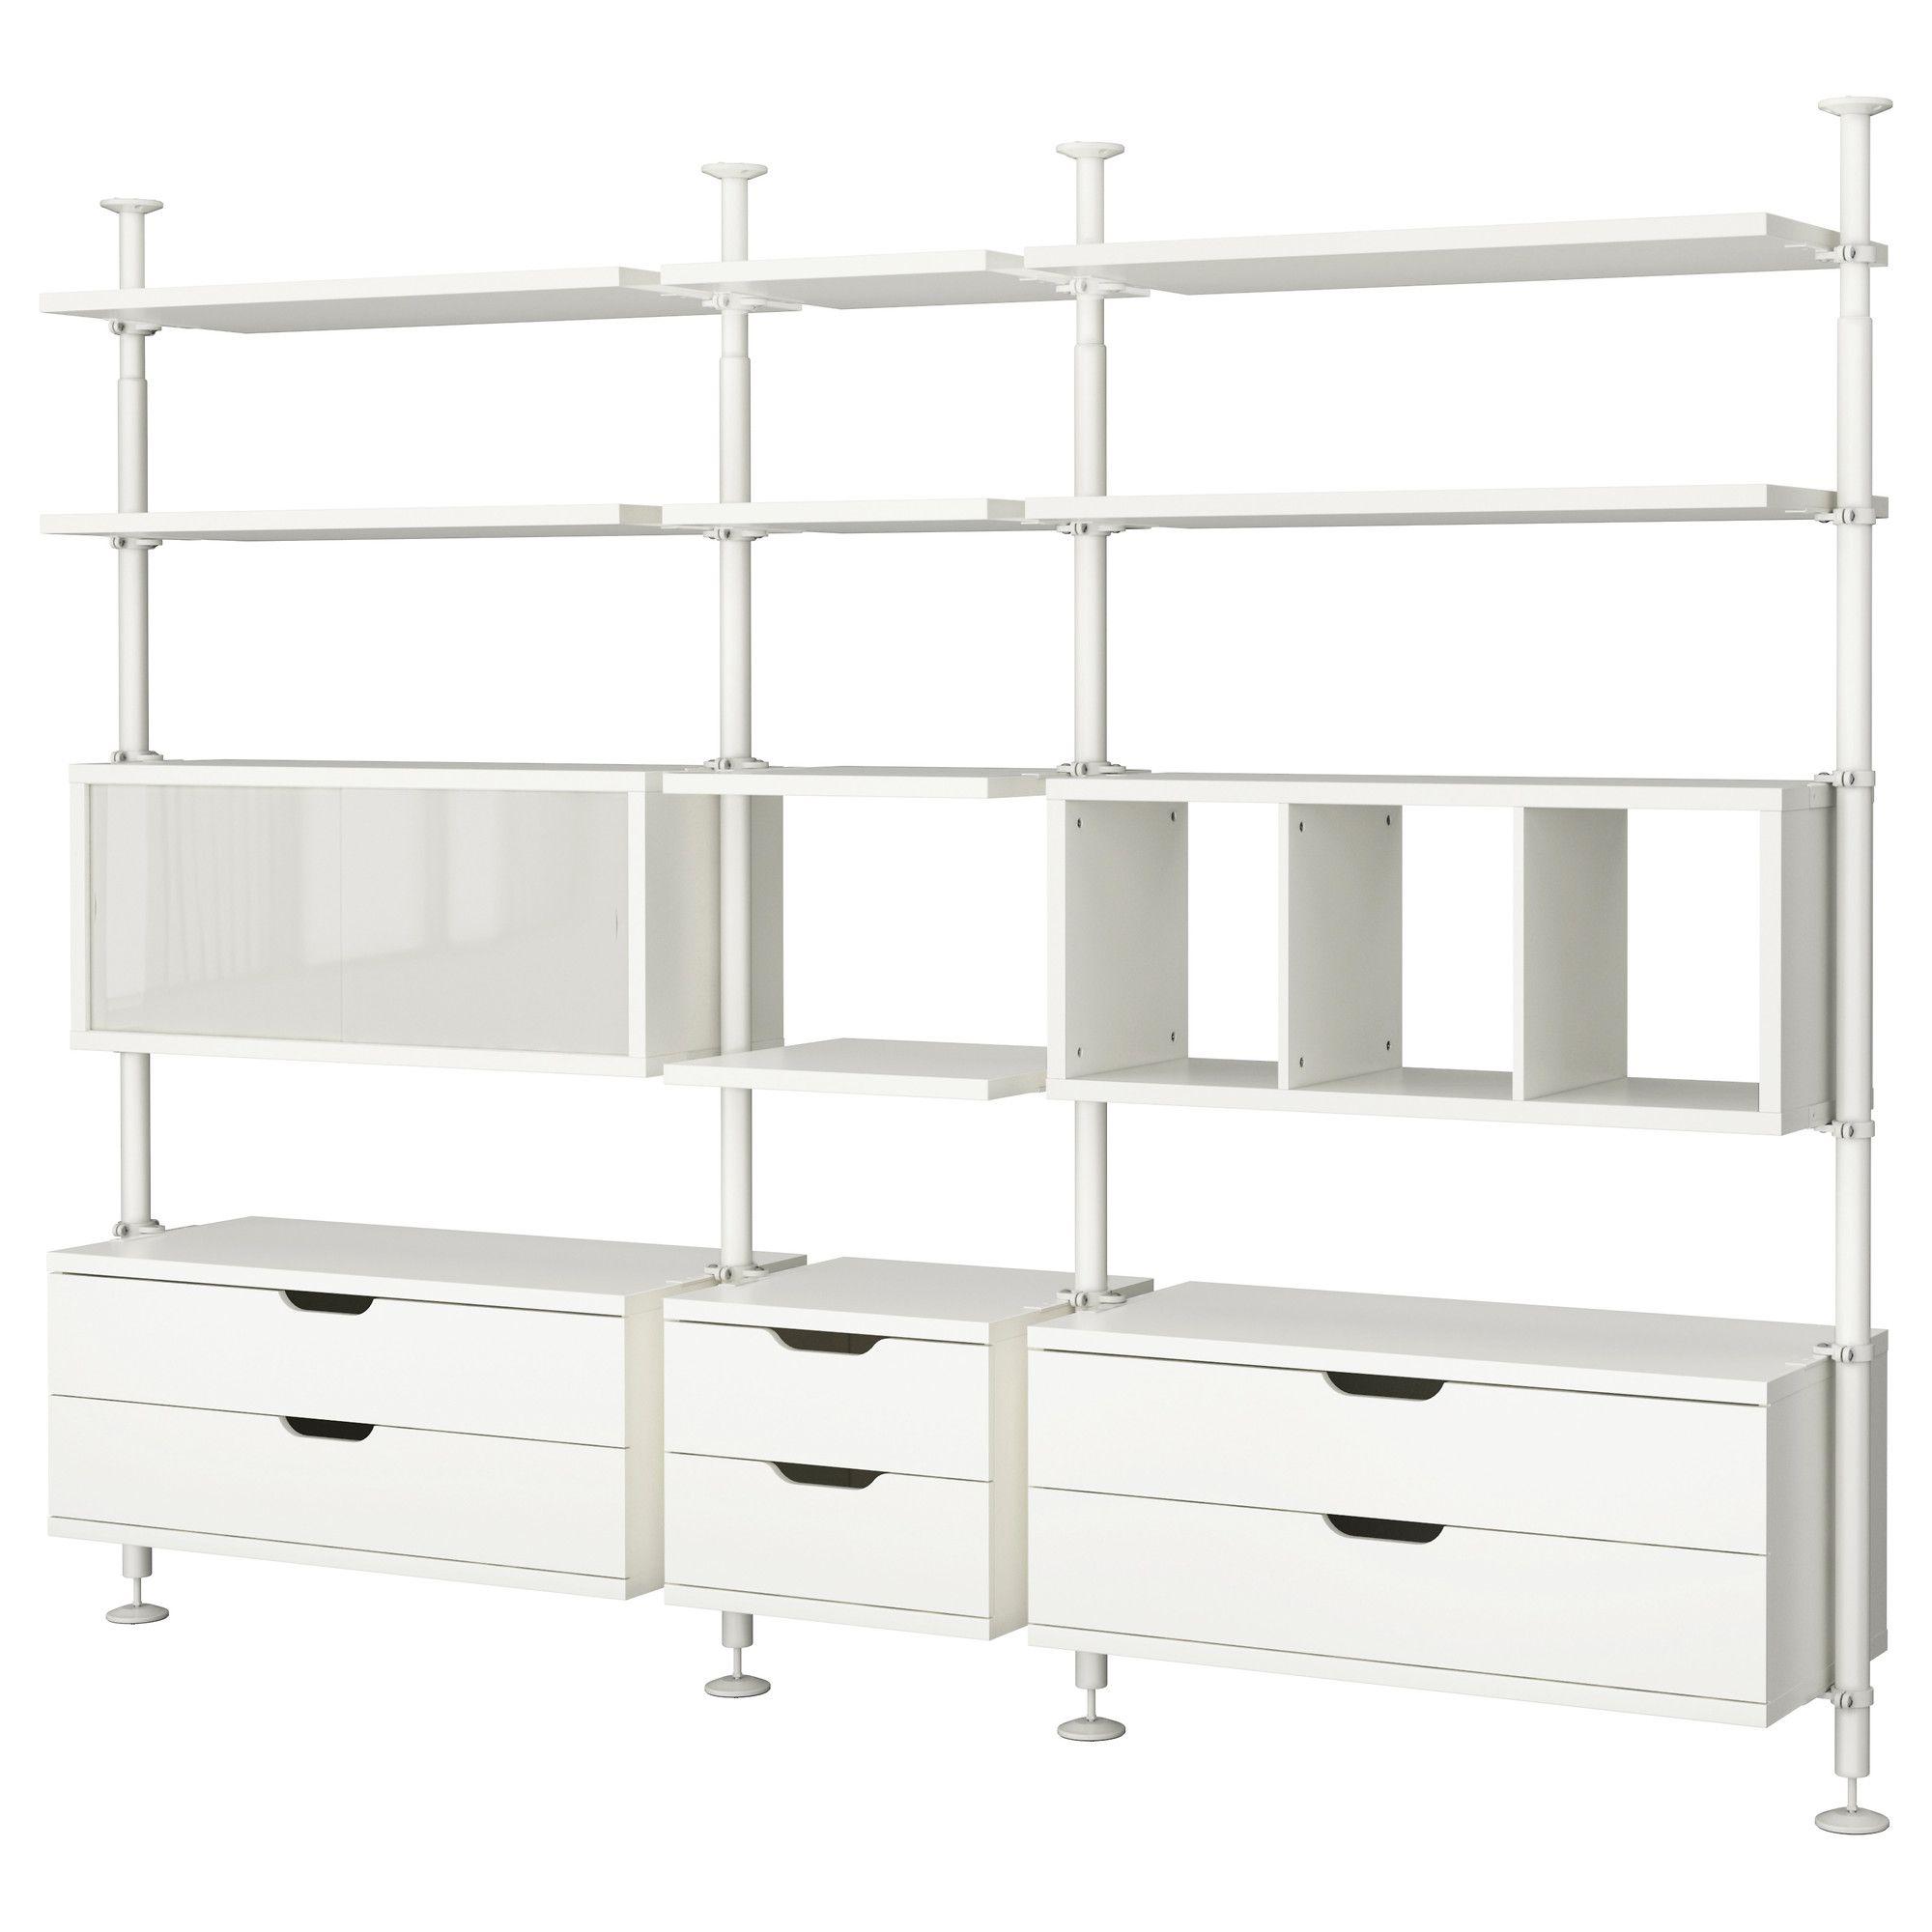 Appealing Ikea Closet Jewelry Storage Drawers